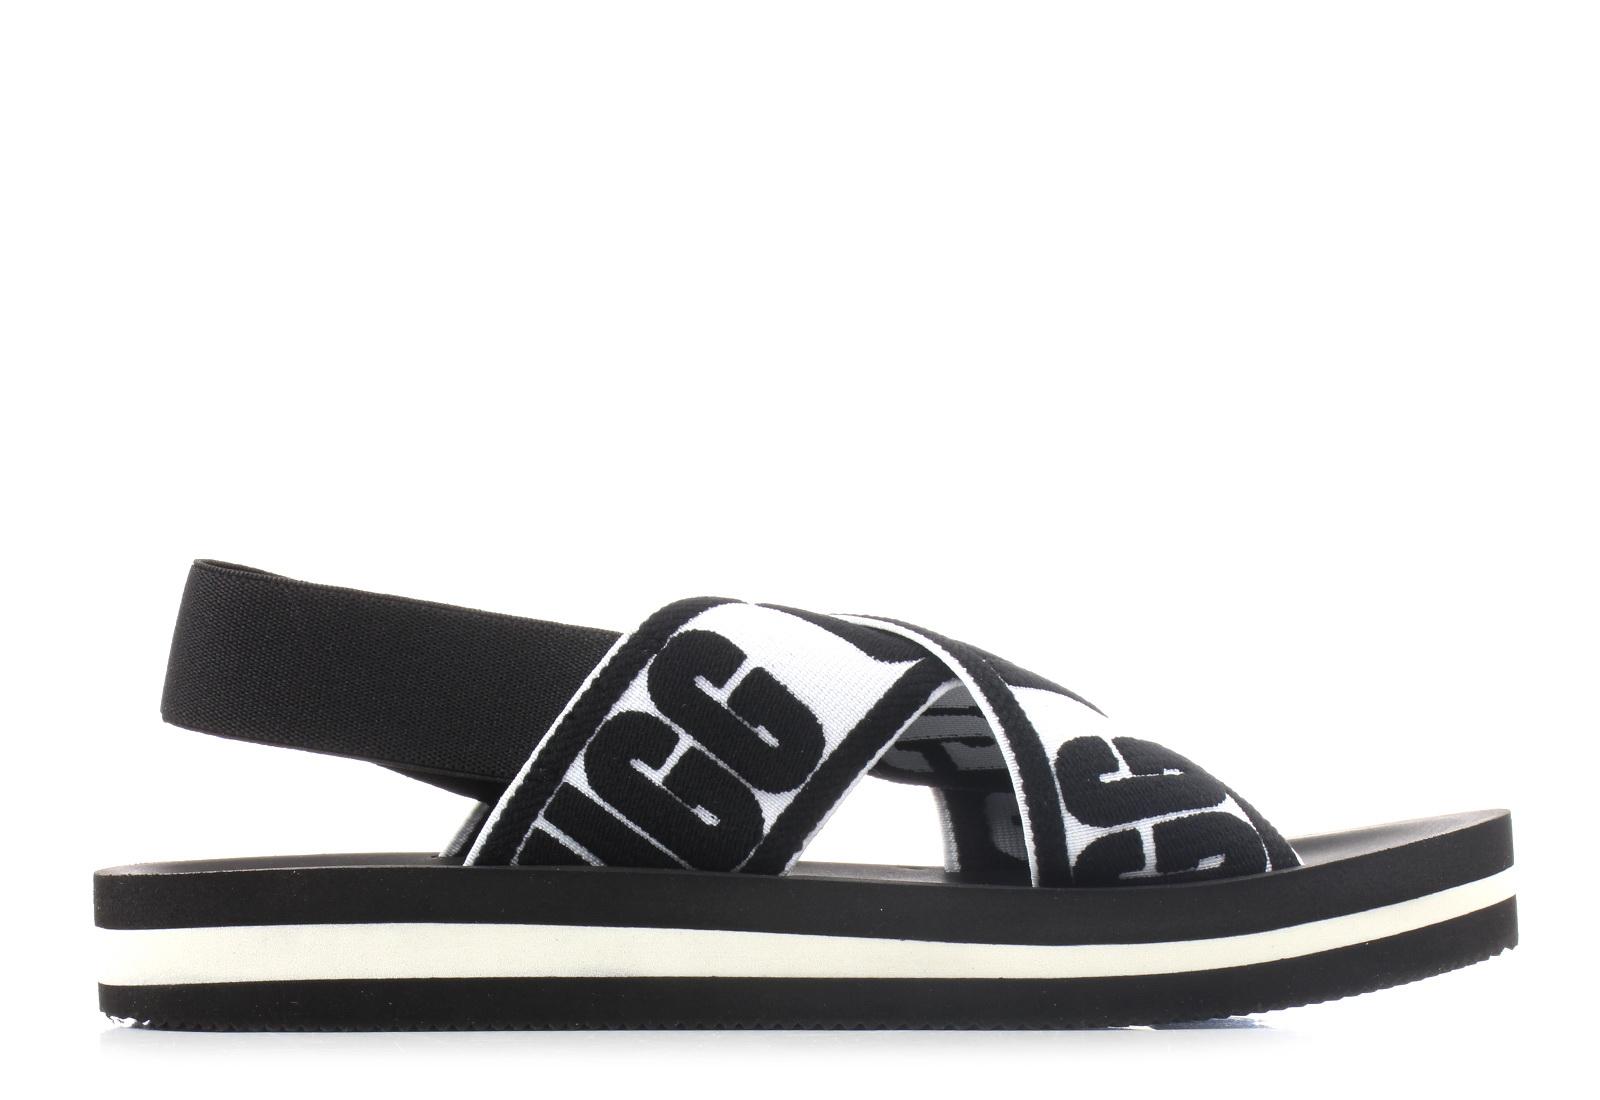 c23d9ee0eeb3 Ugg Sandals - Marmont Graphic - 1101044-blk - Online shop for ...